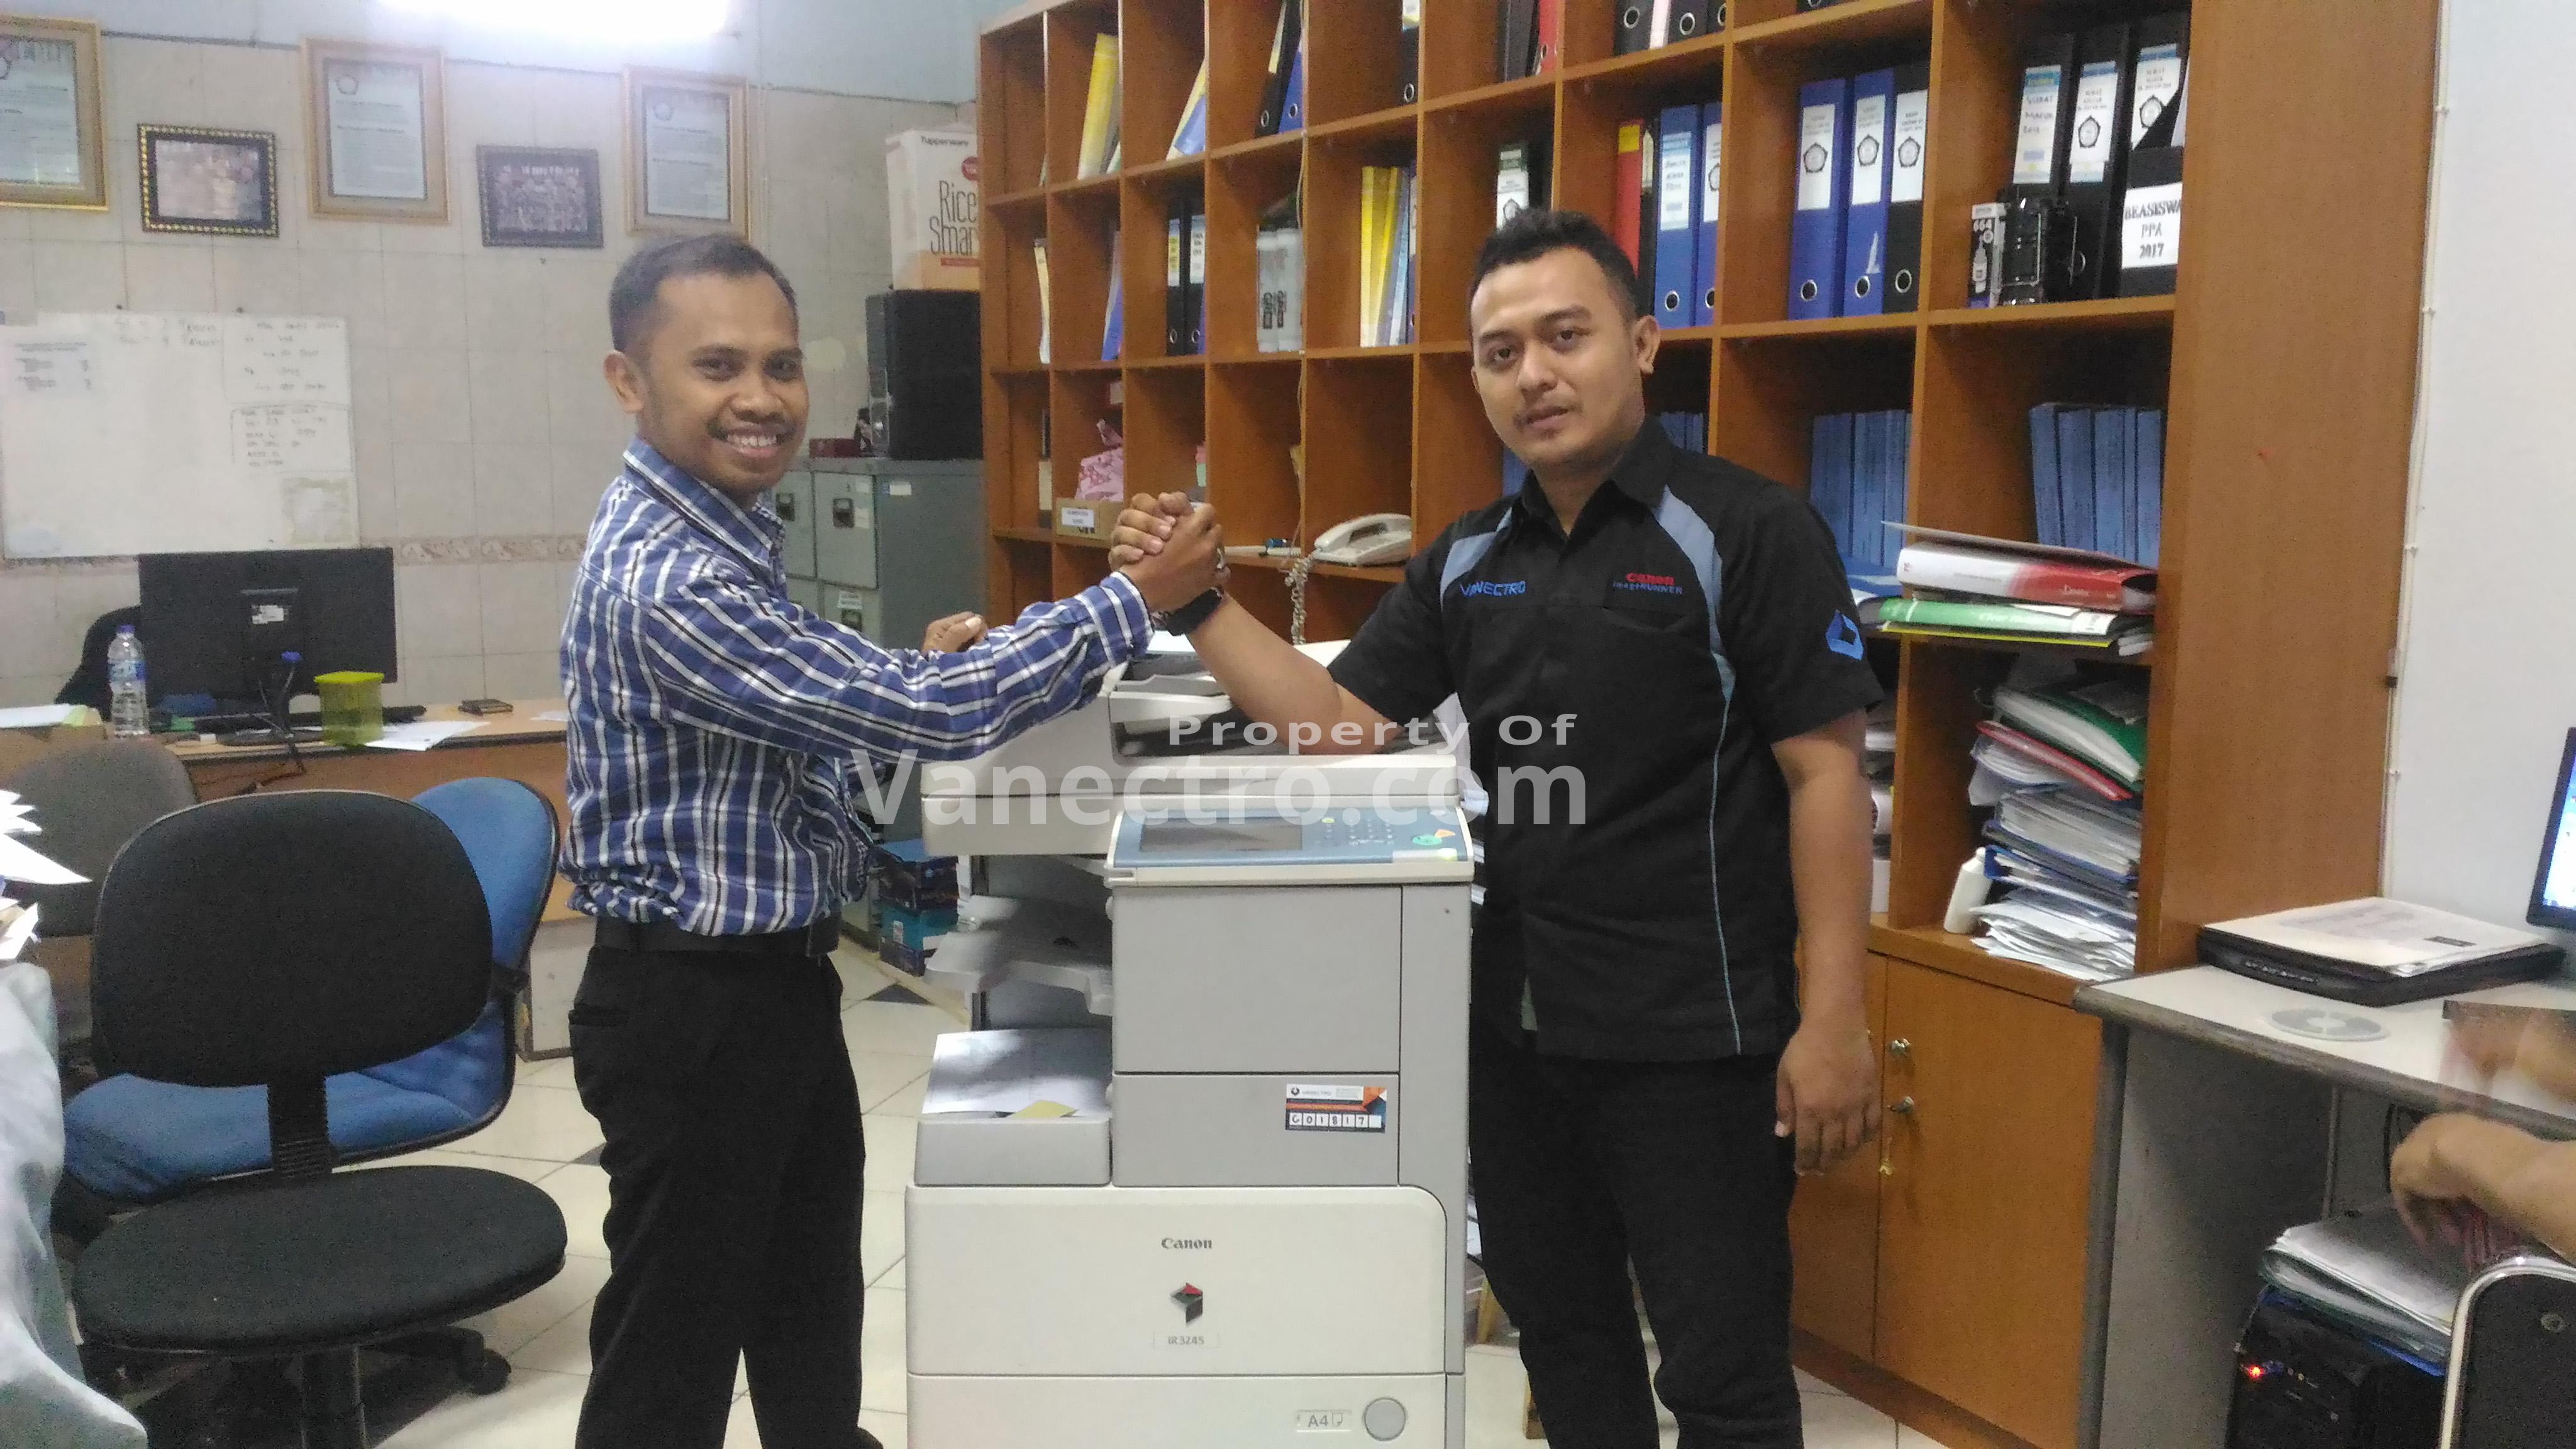 Pengiriman Penjualan Mesin Fotocopy Mesin Fotocopy Canon Ir 3245| 3235 Milik Bp. Idris